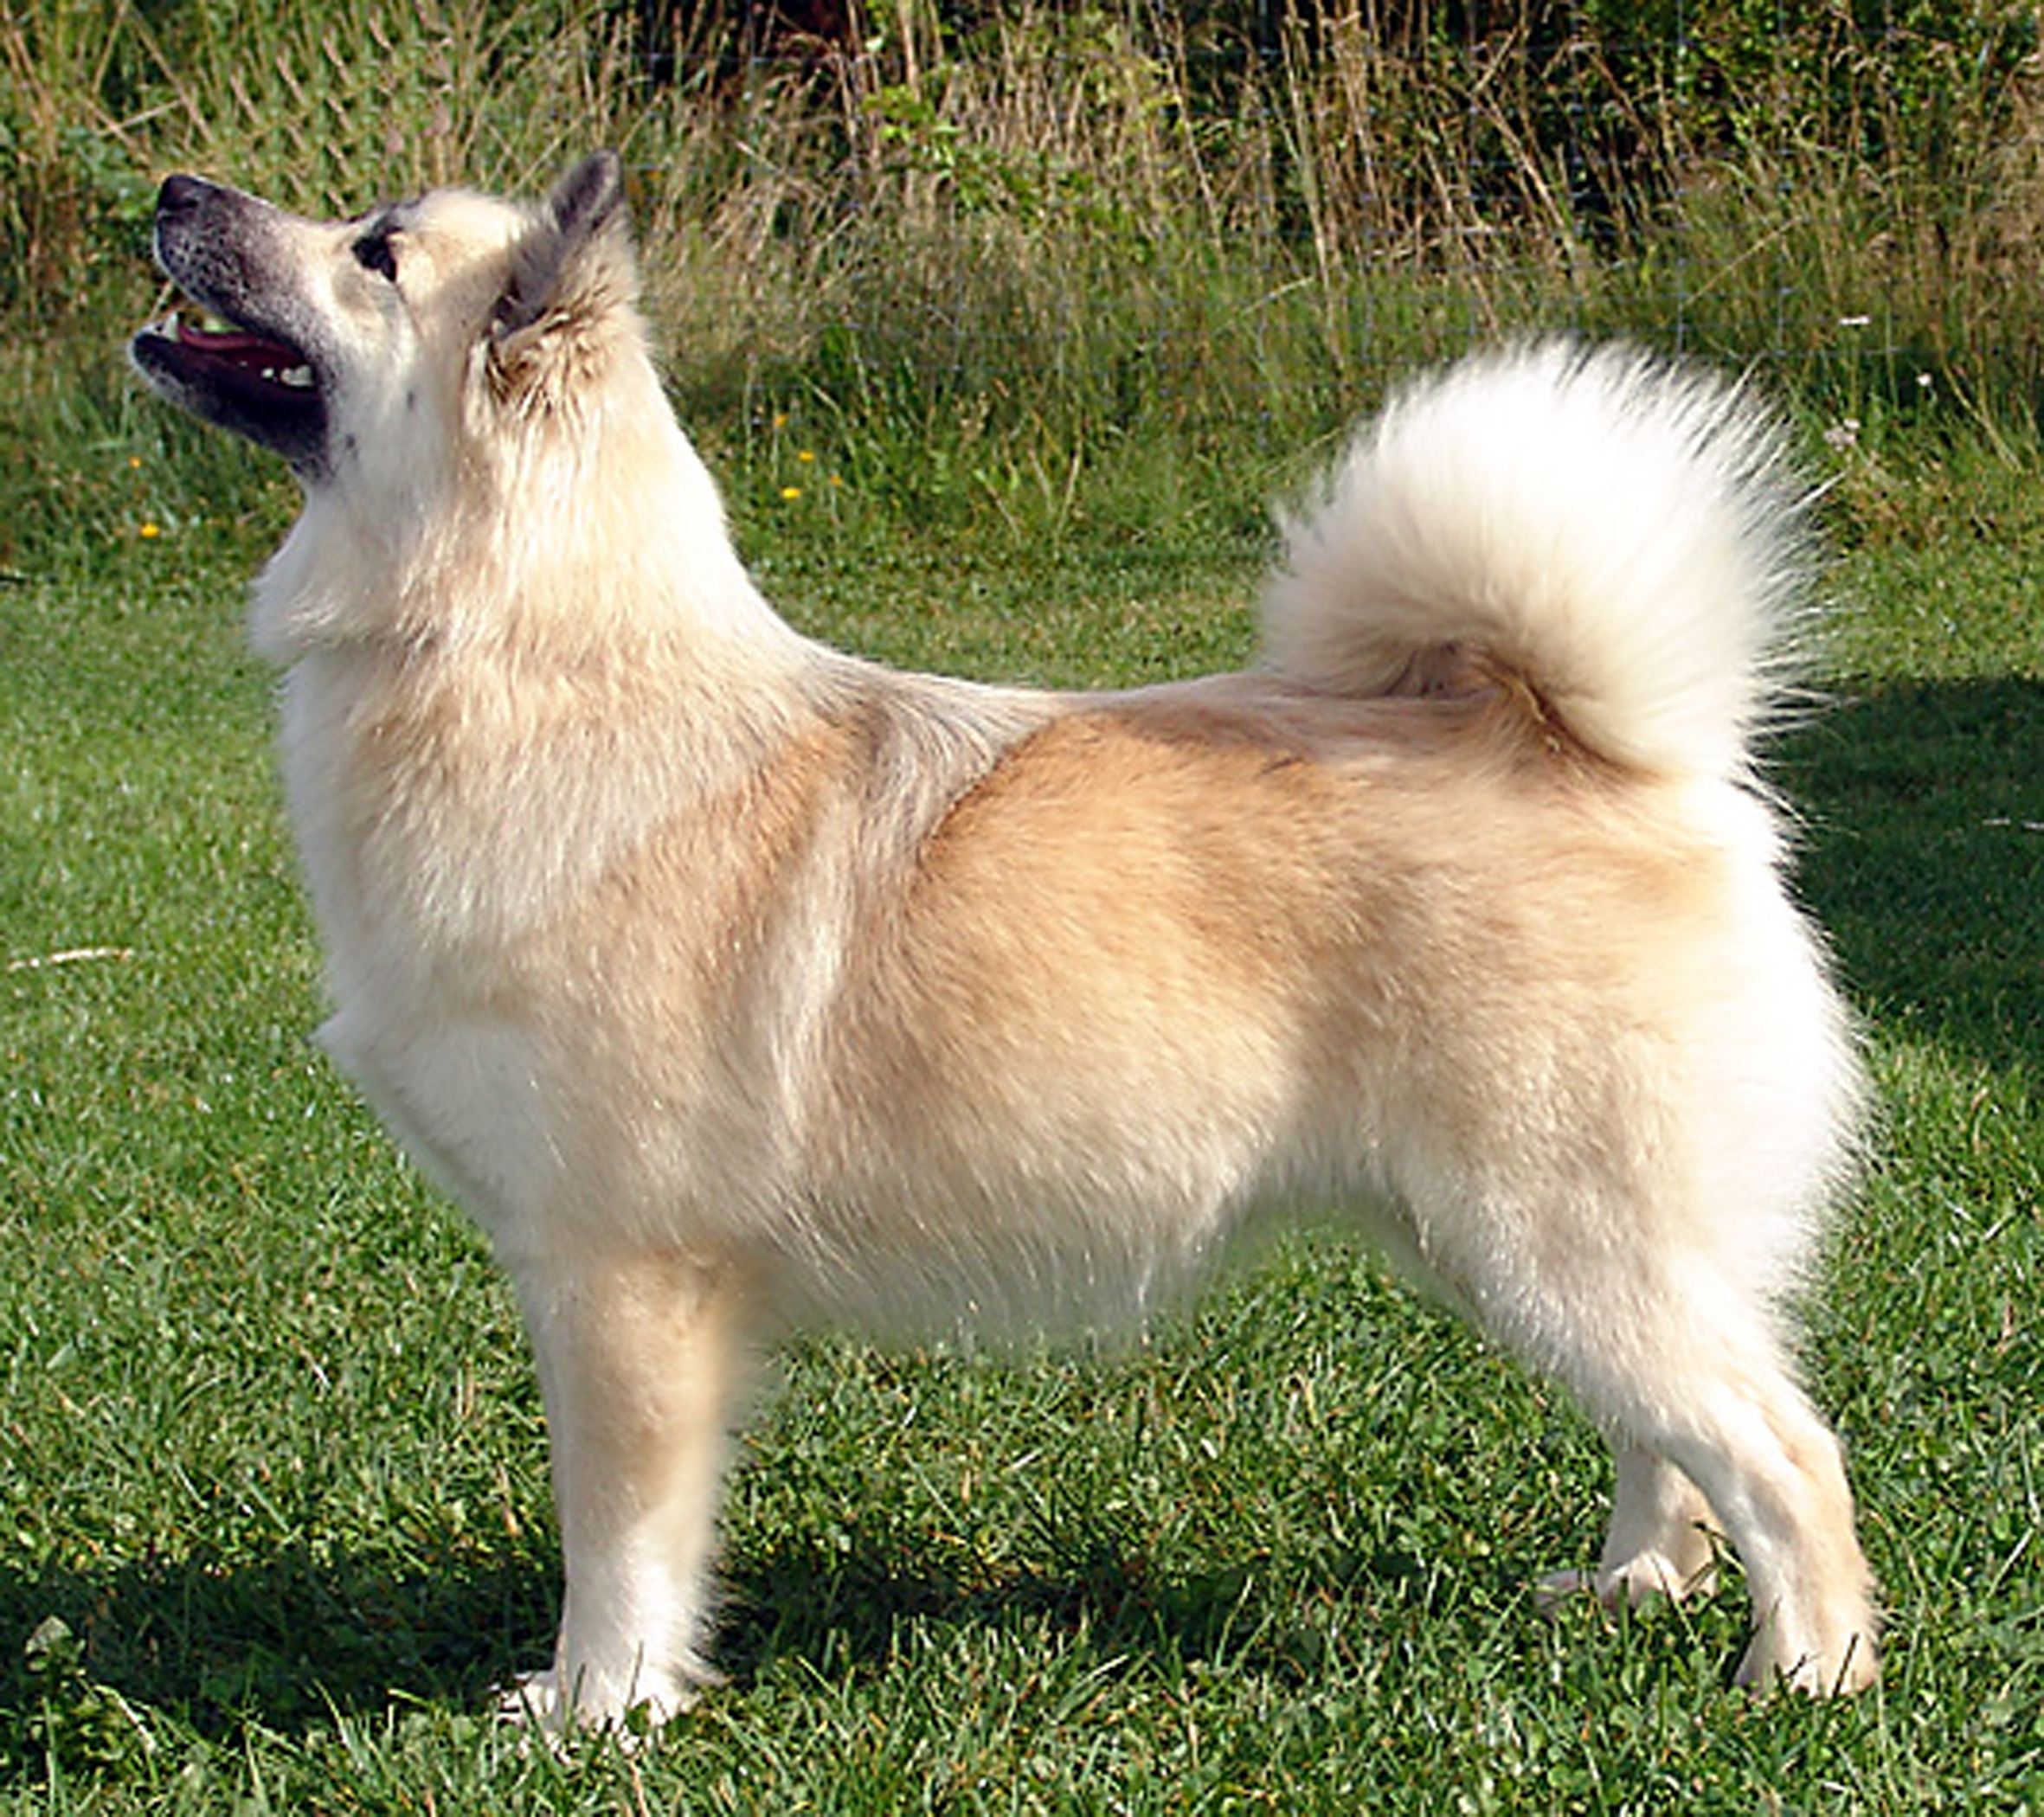 Cumberland Sheepdog Dog: Cumberland Sheepdog Breeds